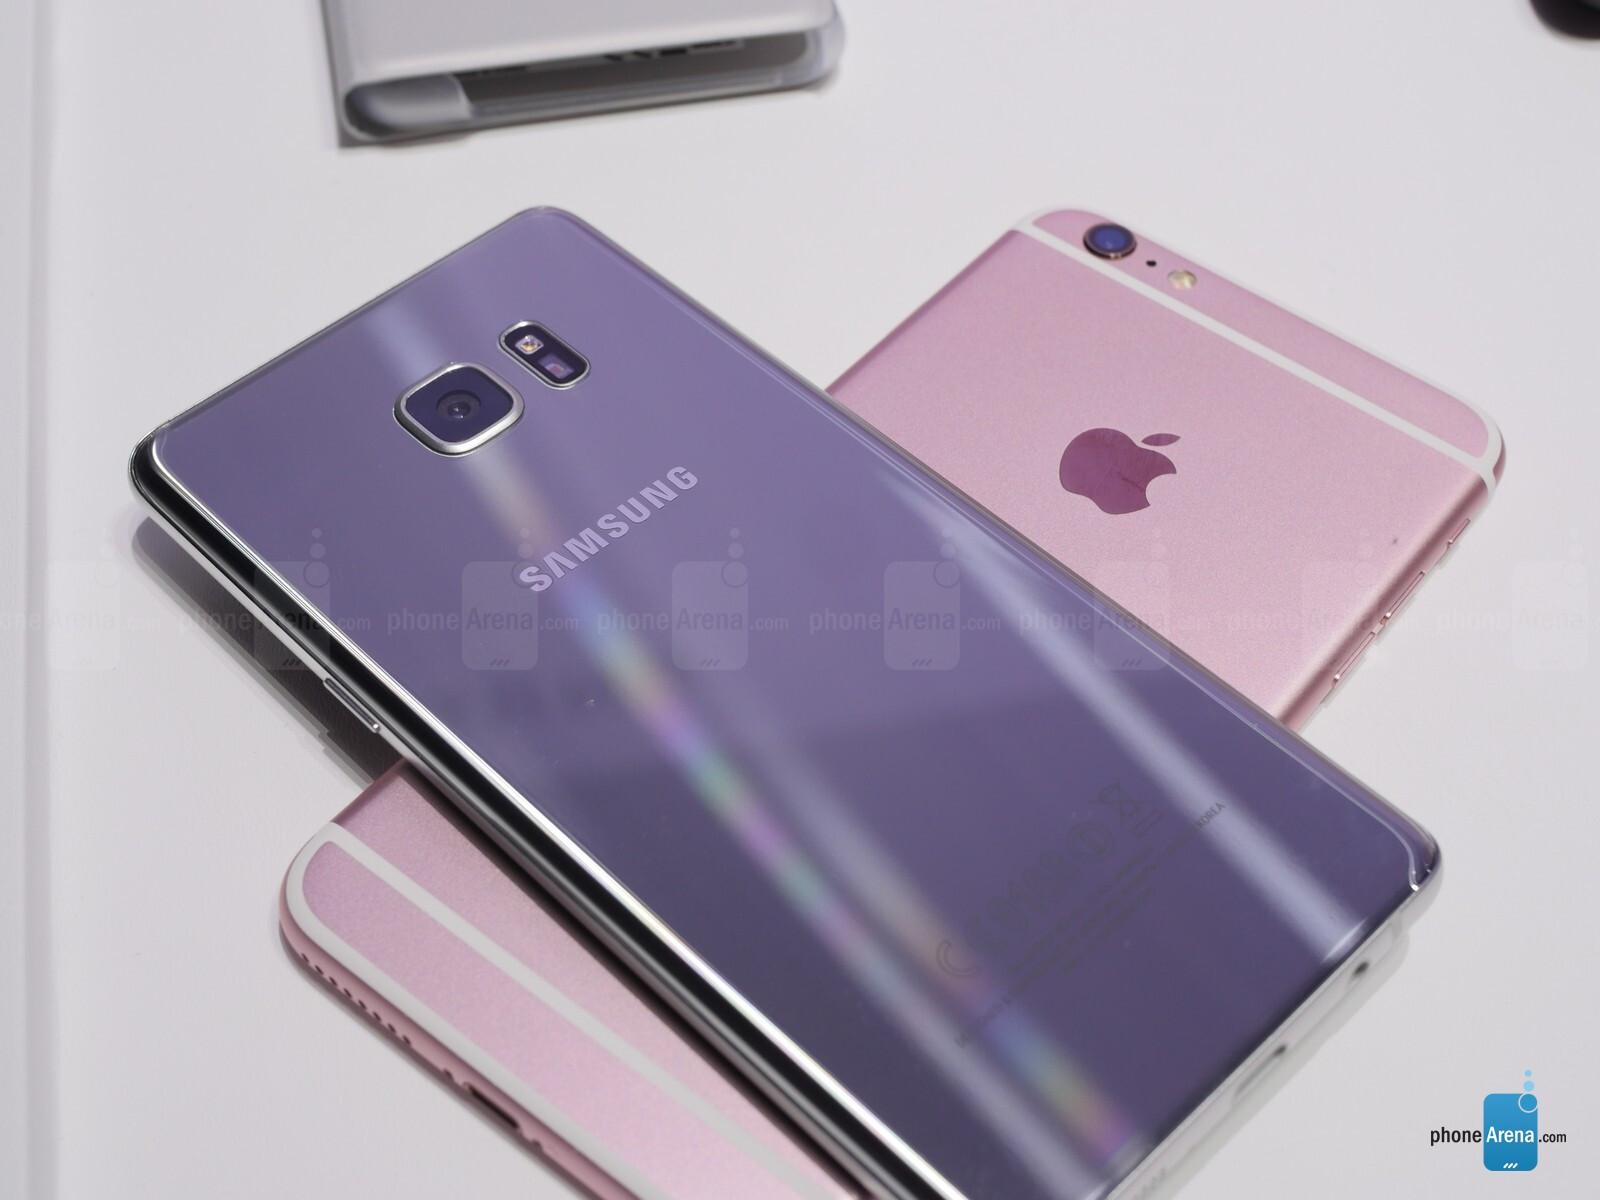 Galaxy Note 7 vs iPhone 6s Plus: big-screen flagship ...